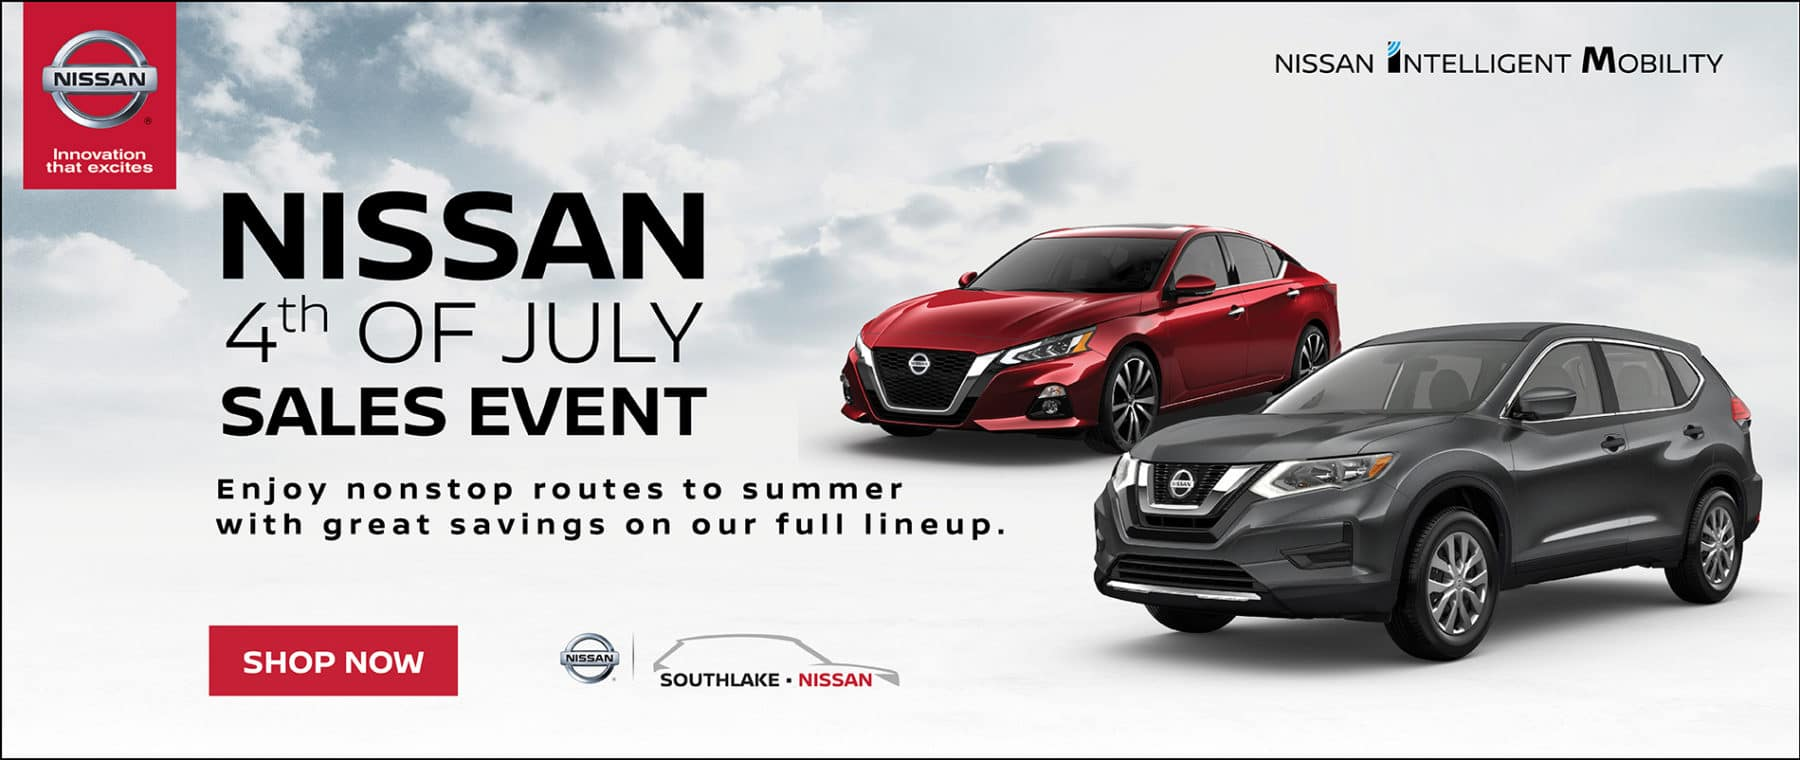 Nissan 4th of July Sales Event | Soutlhlake Nissan